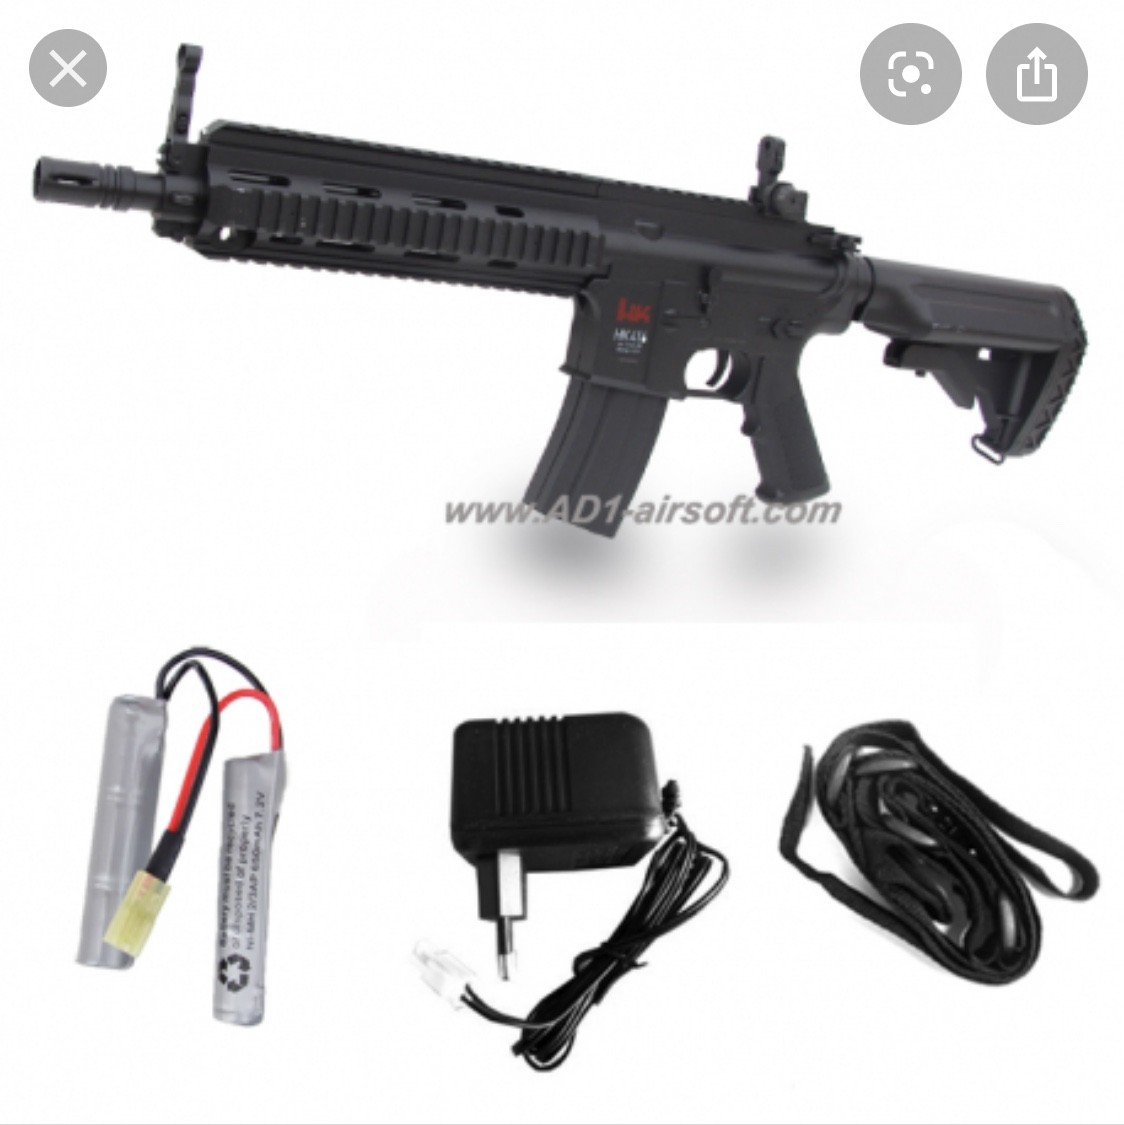 Vend replique airsoft HK416